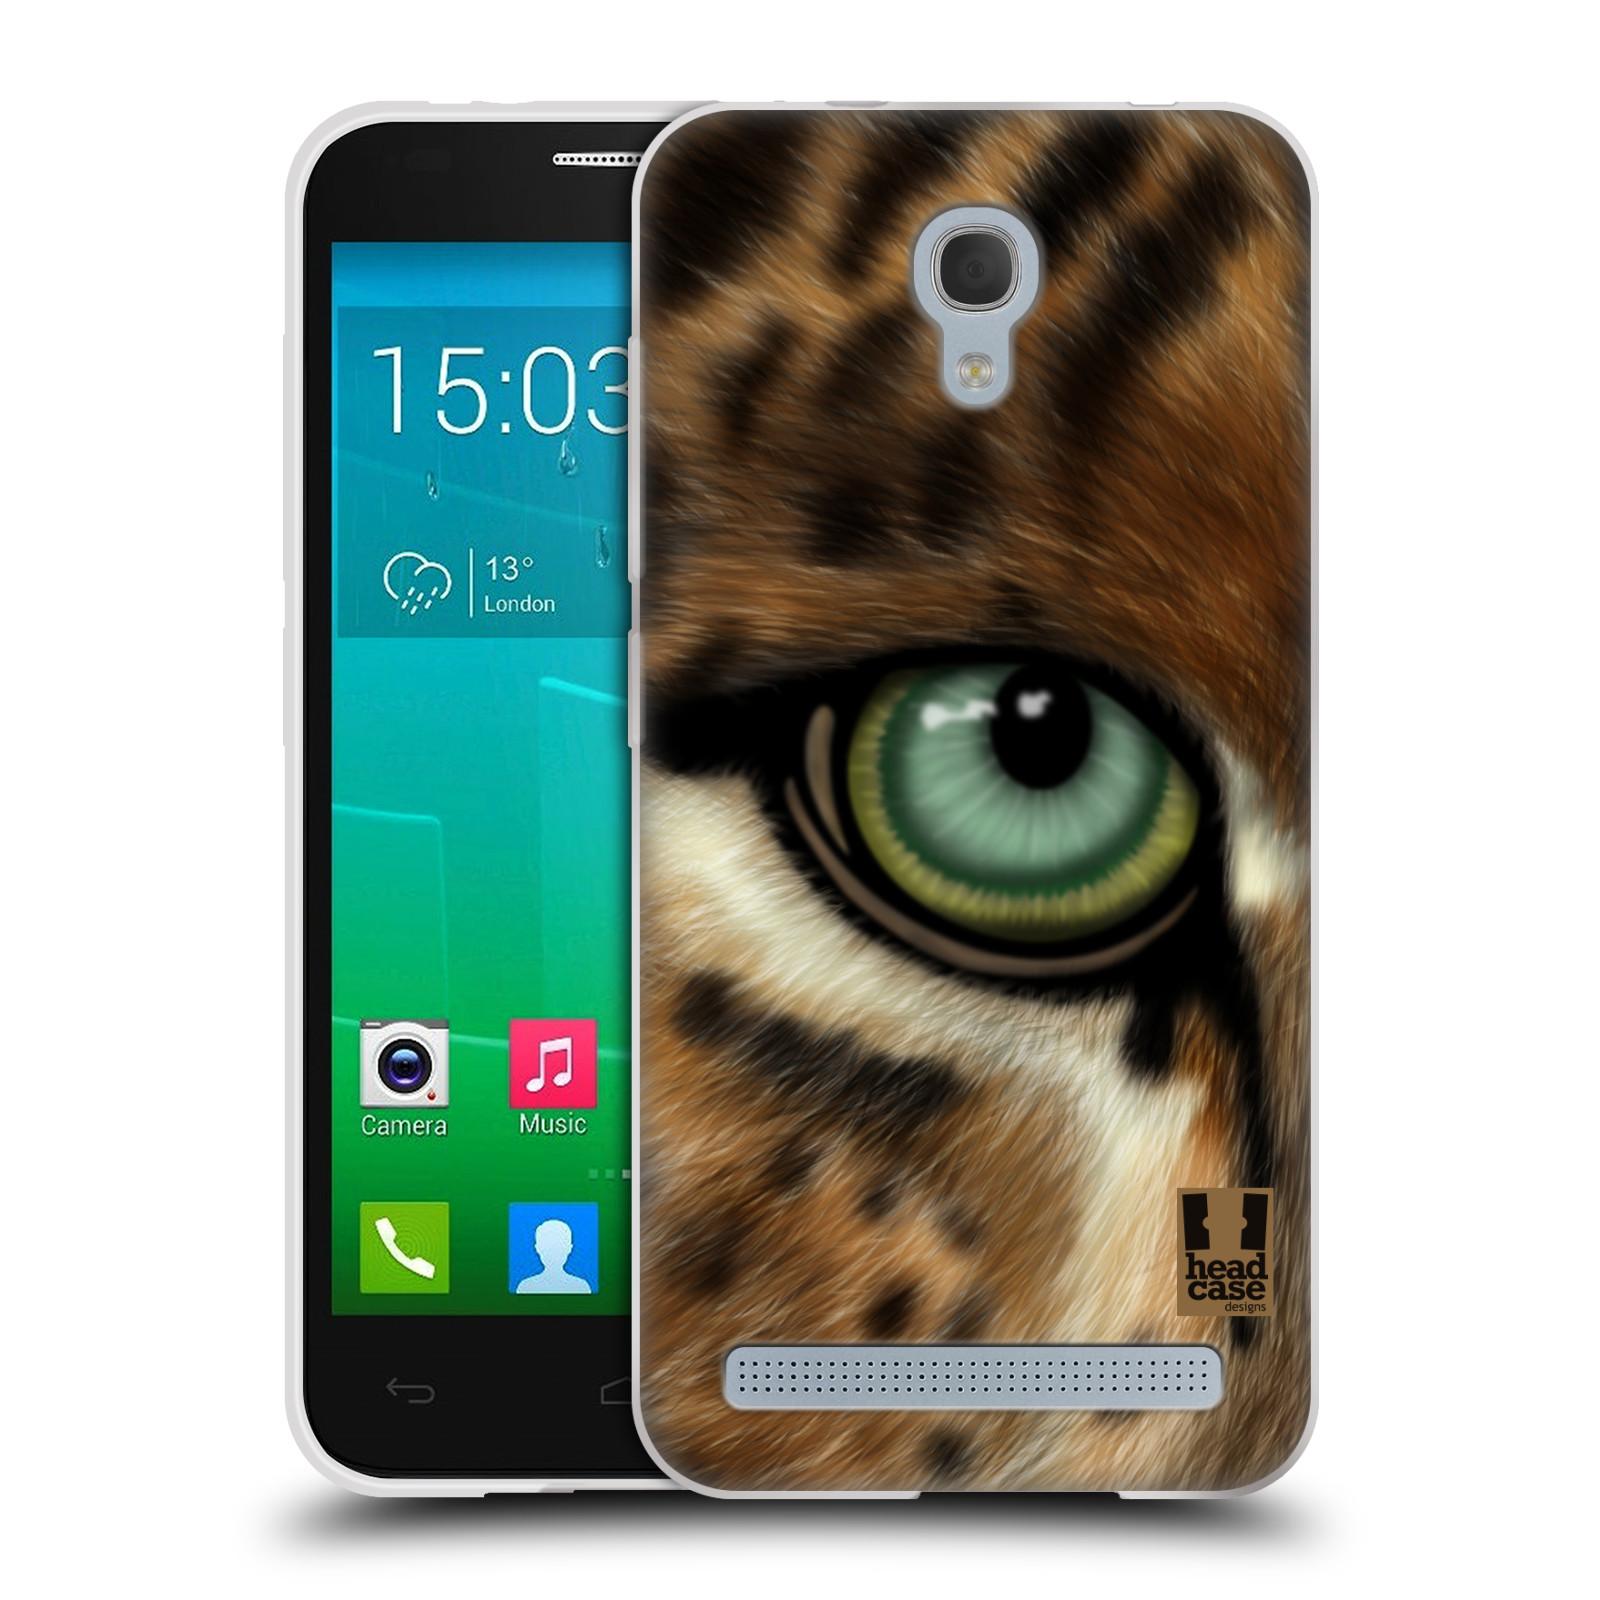 HEAD CASE silikonový obal na mobil Alcatel Idol 2 MINI S 6036Y vzor pohled zvířete oko leopard